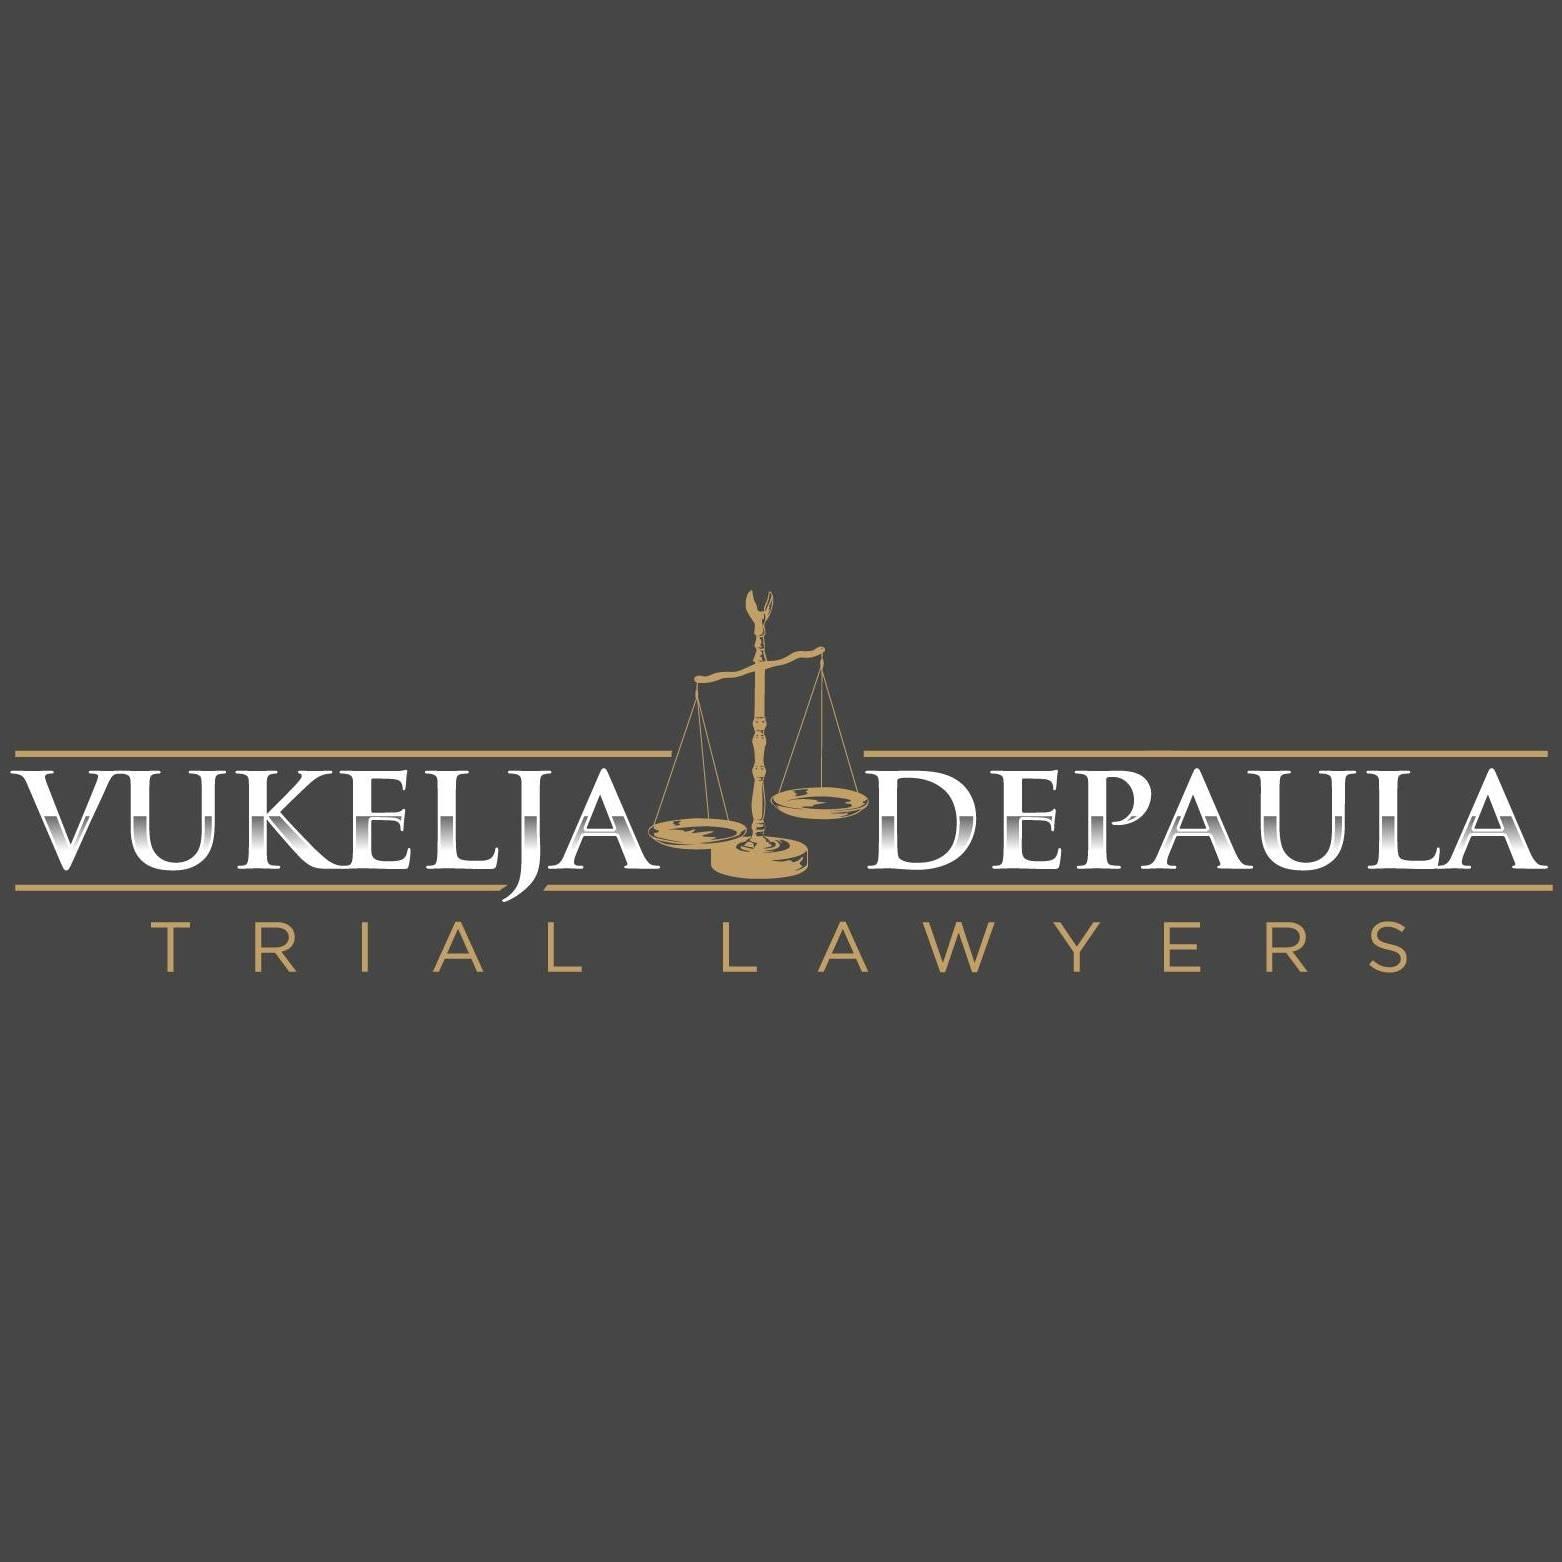 Vukelja & dePaula Named One Of The Top Personal Injury Attorneys In Ormond Beach, FL